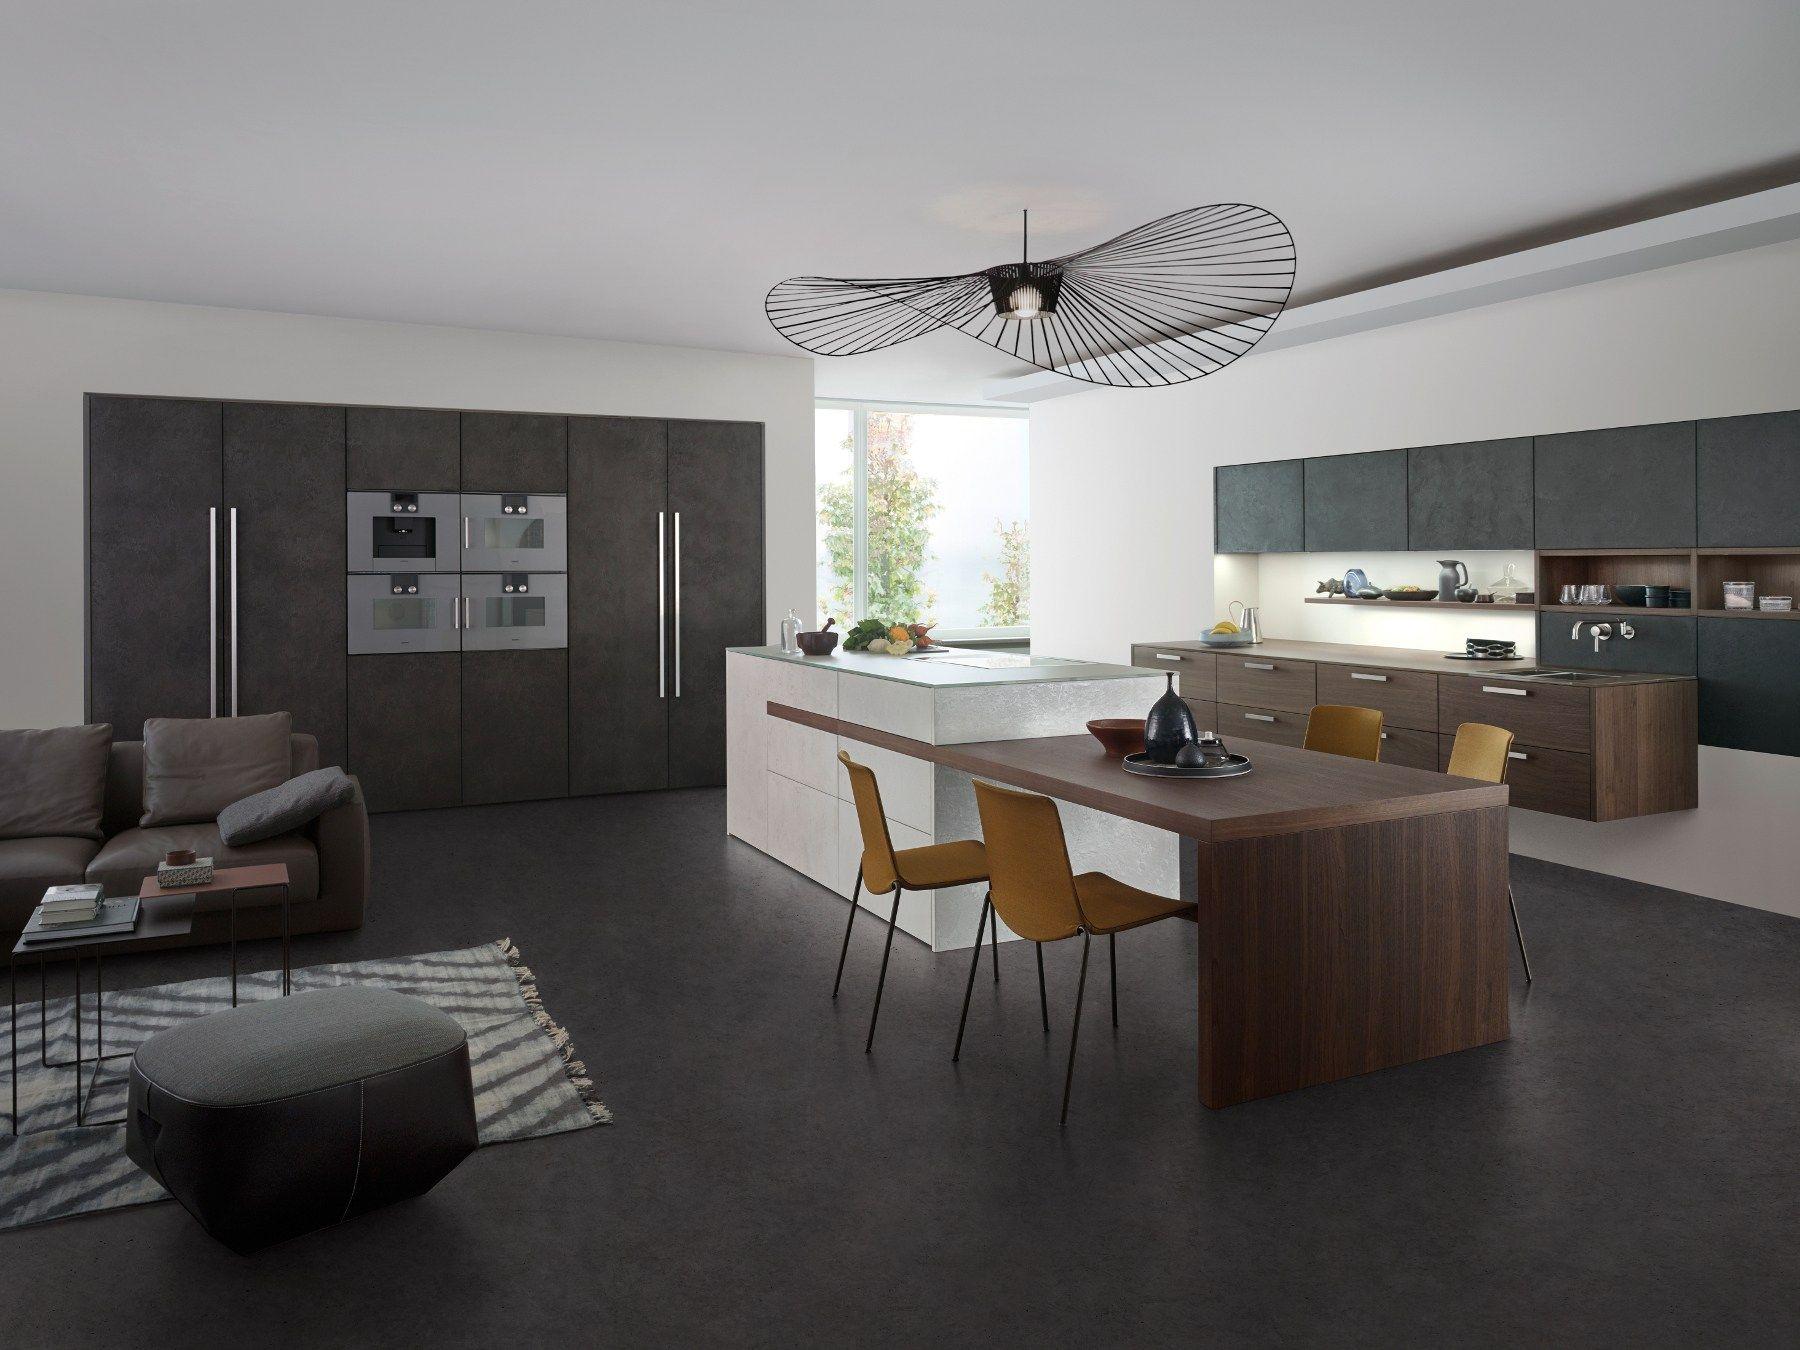 Cocina Con Isla Concrete By Leicht Kuchen Keuken Cuisine Leicht Cuisine Equipee Moderne Et Cuisine Equipee